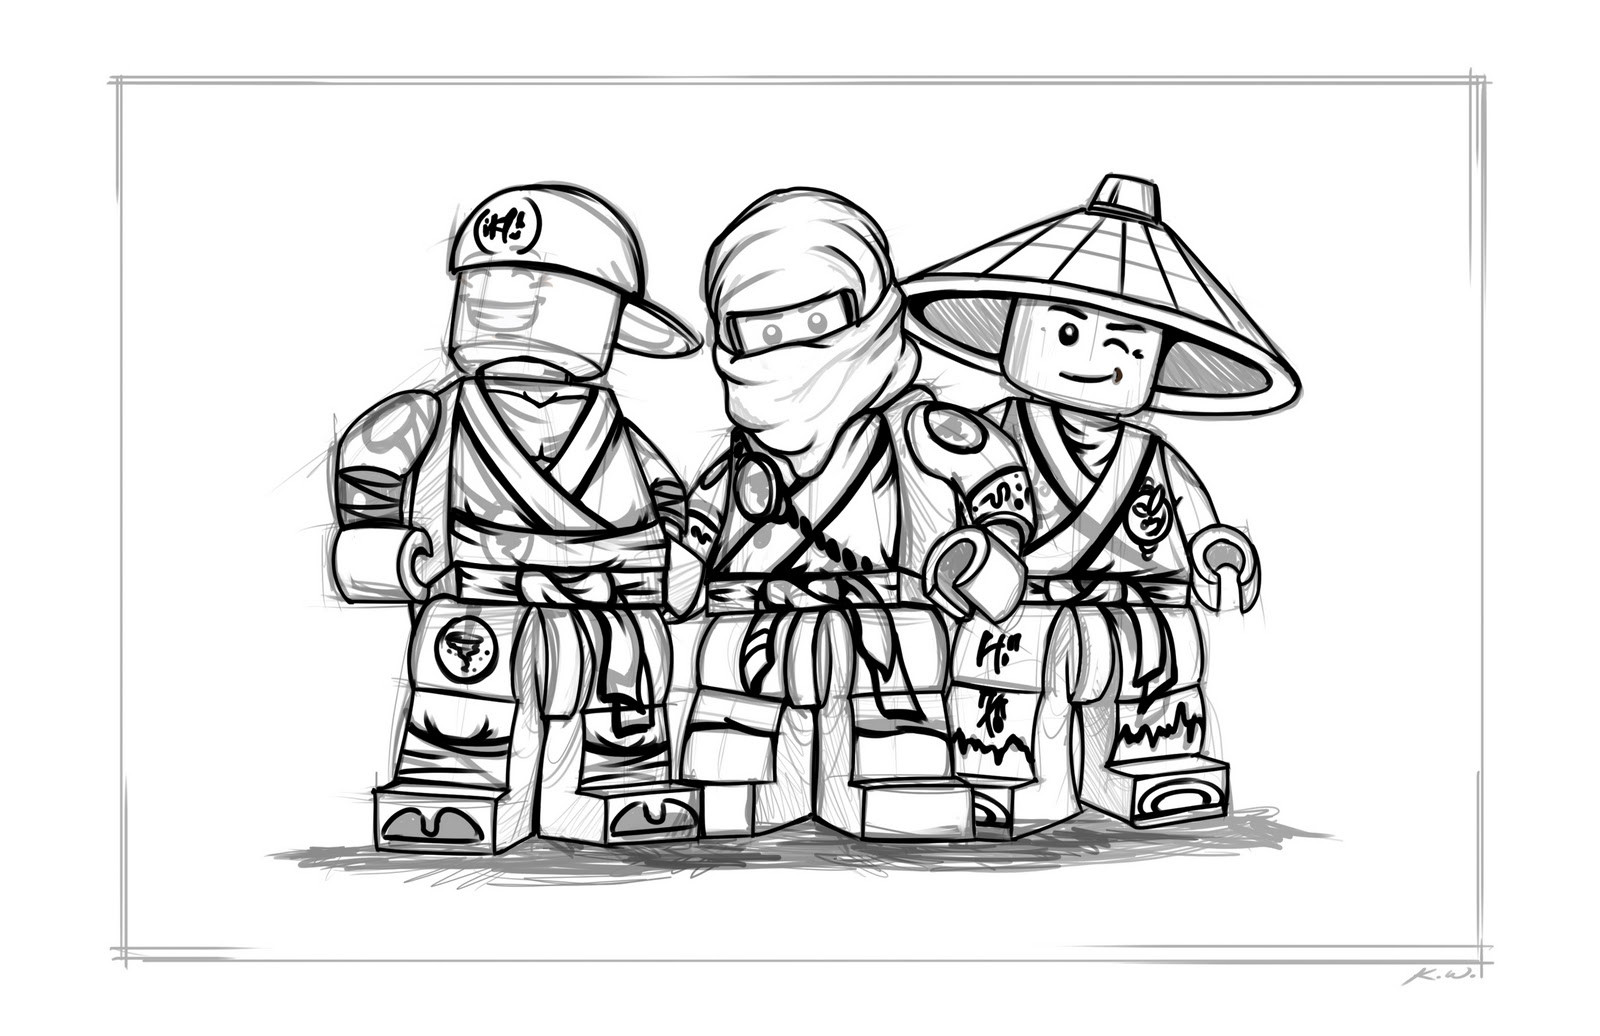 Lego Malvorlagen  Malvorlagen fur kinder Ausmalbilder Lego Ninjago